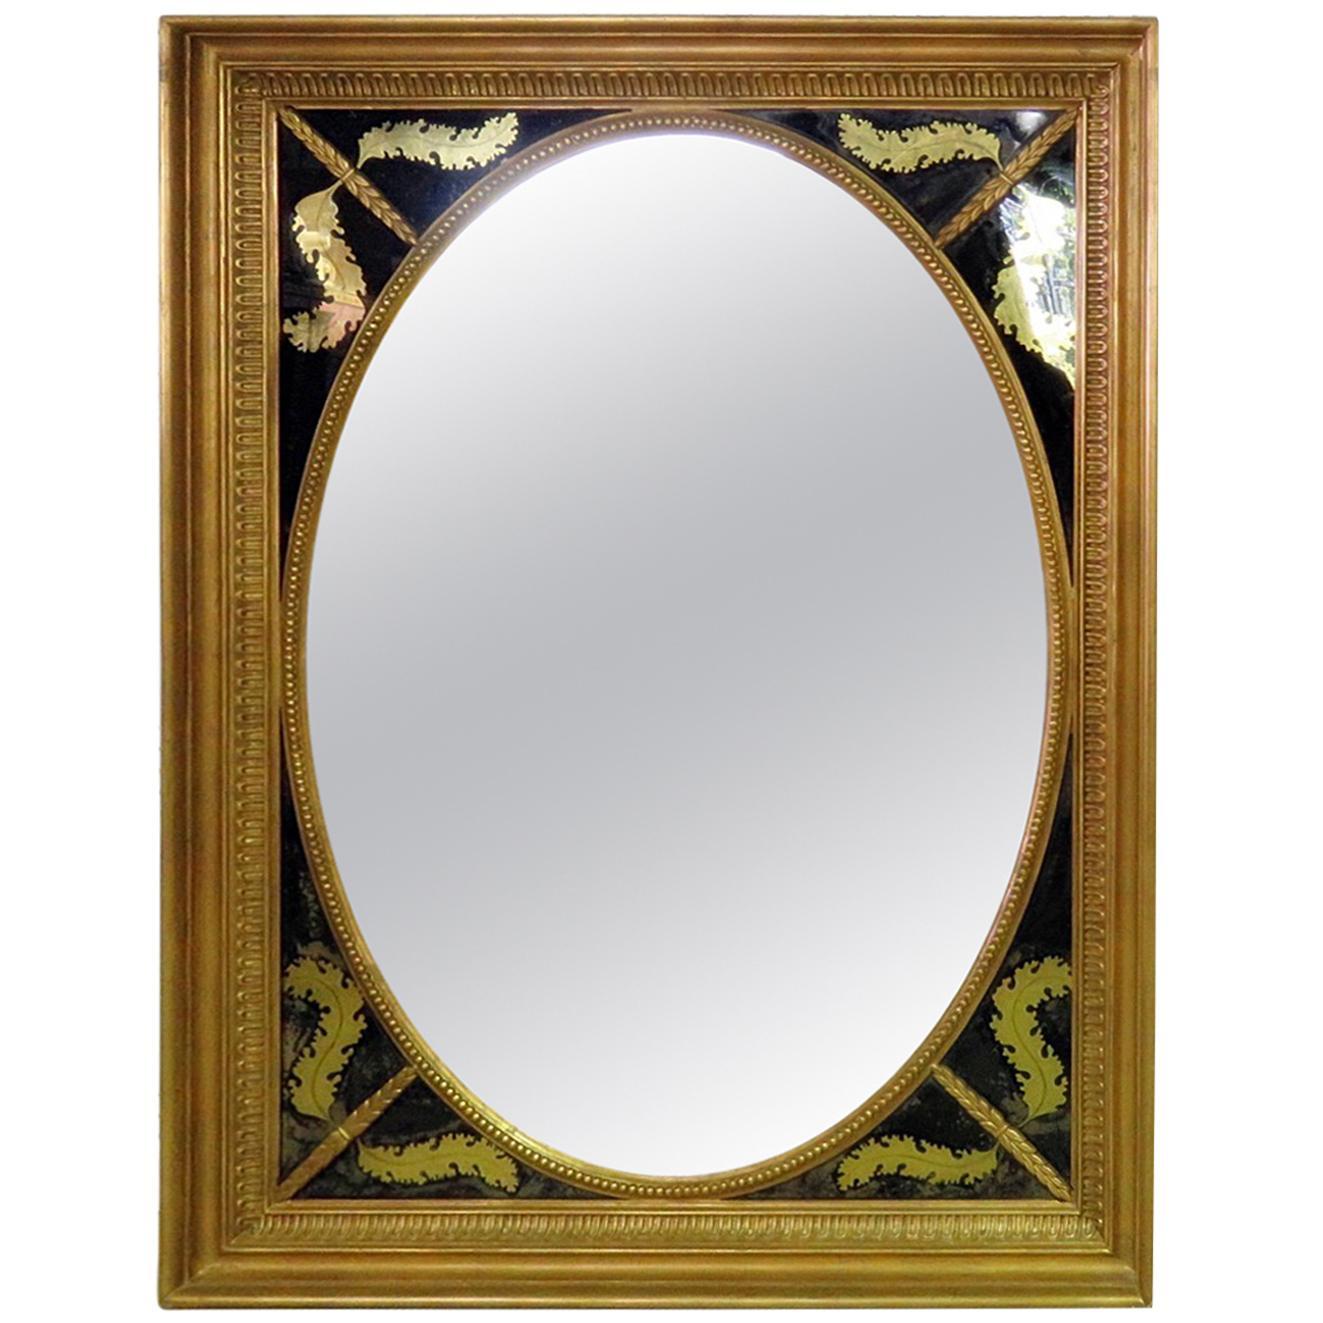 Antique French Gold Verre Eglomise Louis XVI Style Mirror